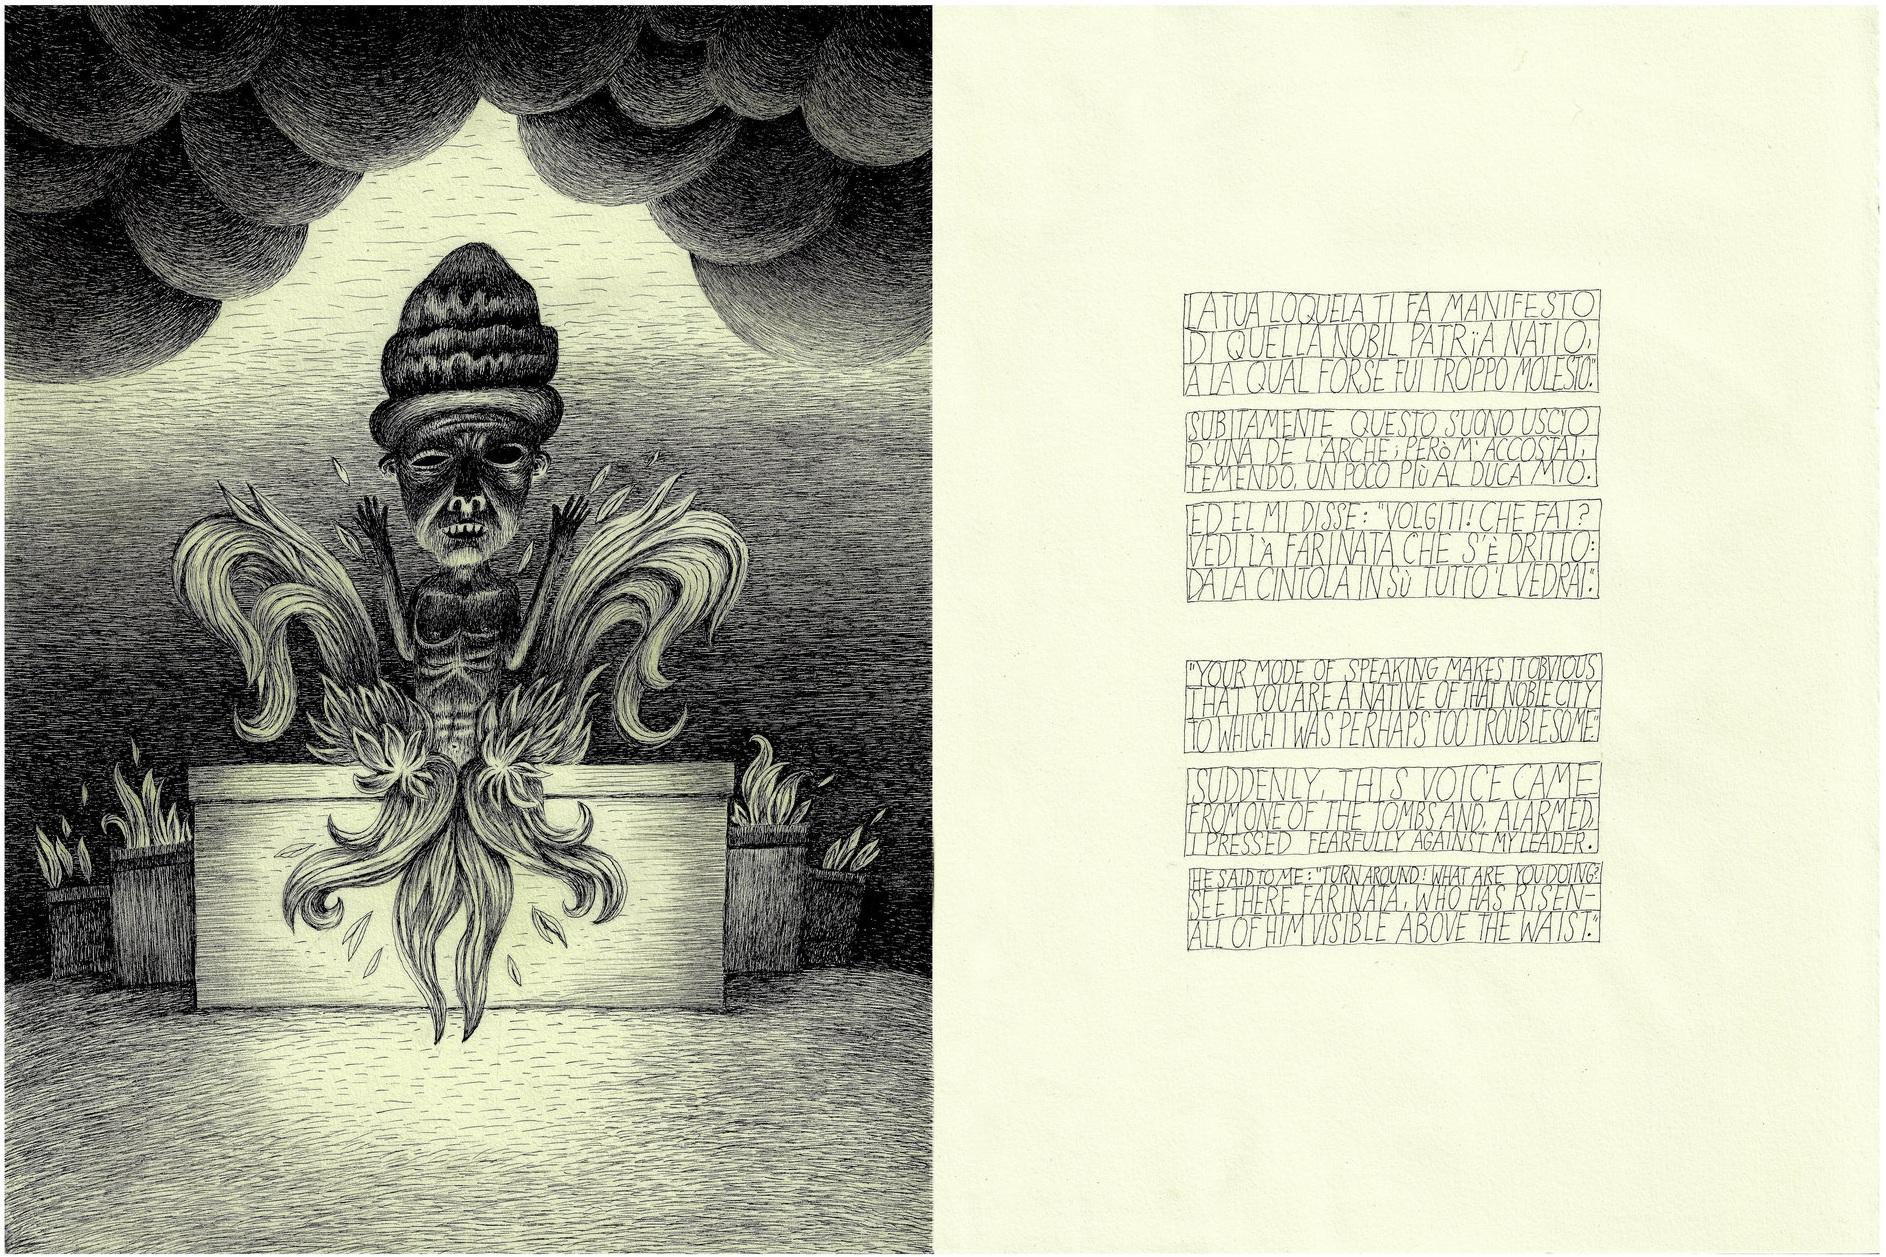 Illustrating Dante's Inferno_Infosession_Full Program_Page_42.jpg